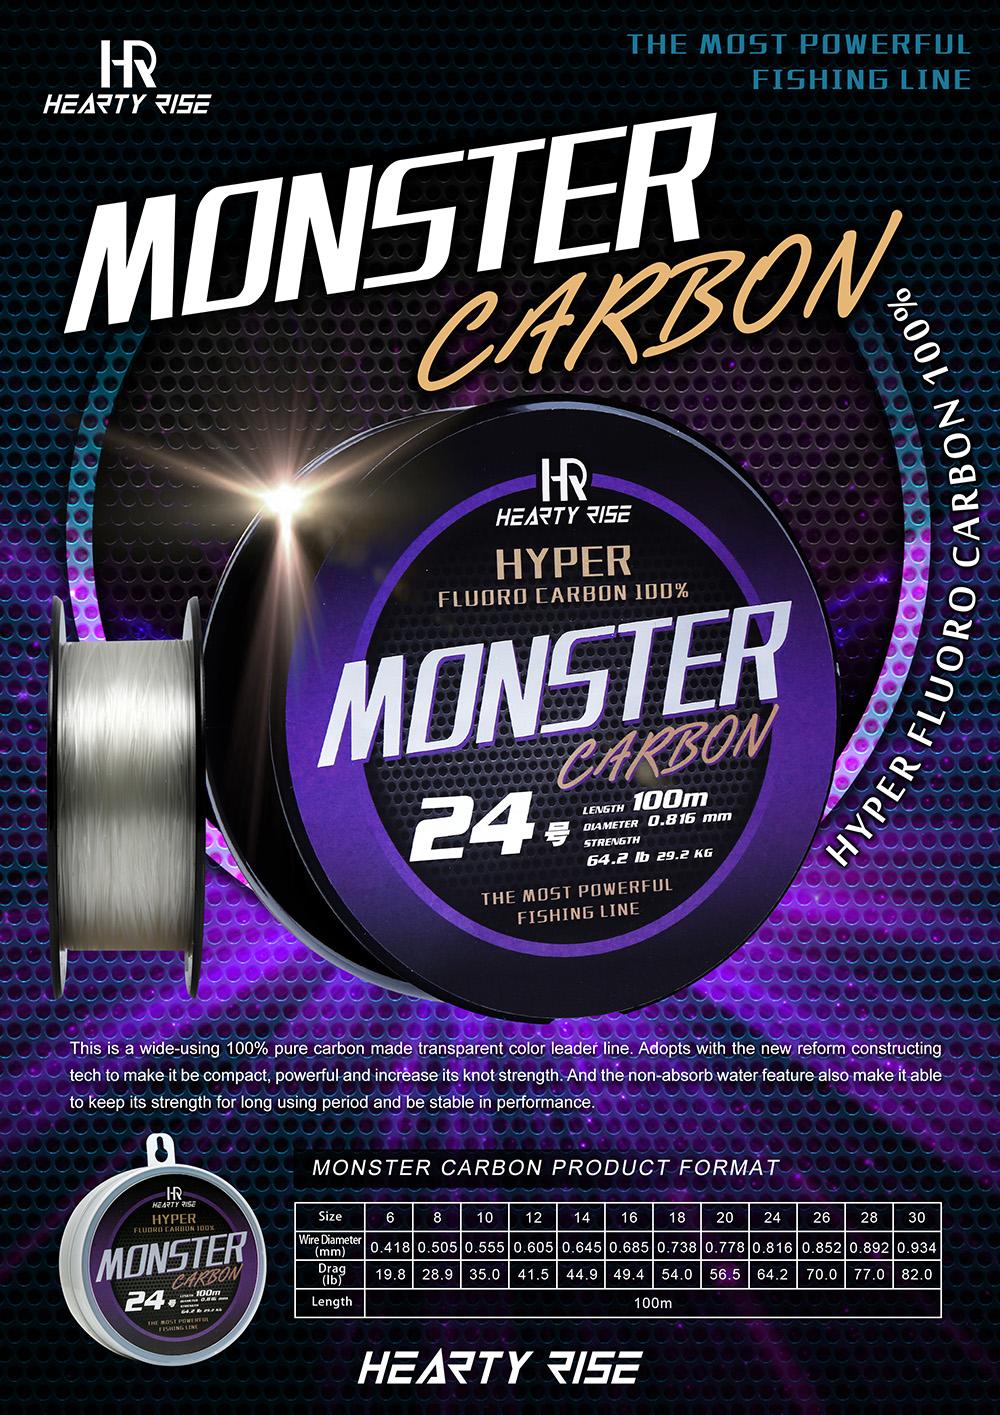 HR MONSTER CARBON 1000-02